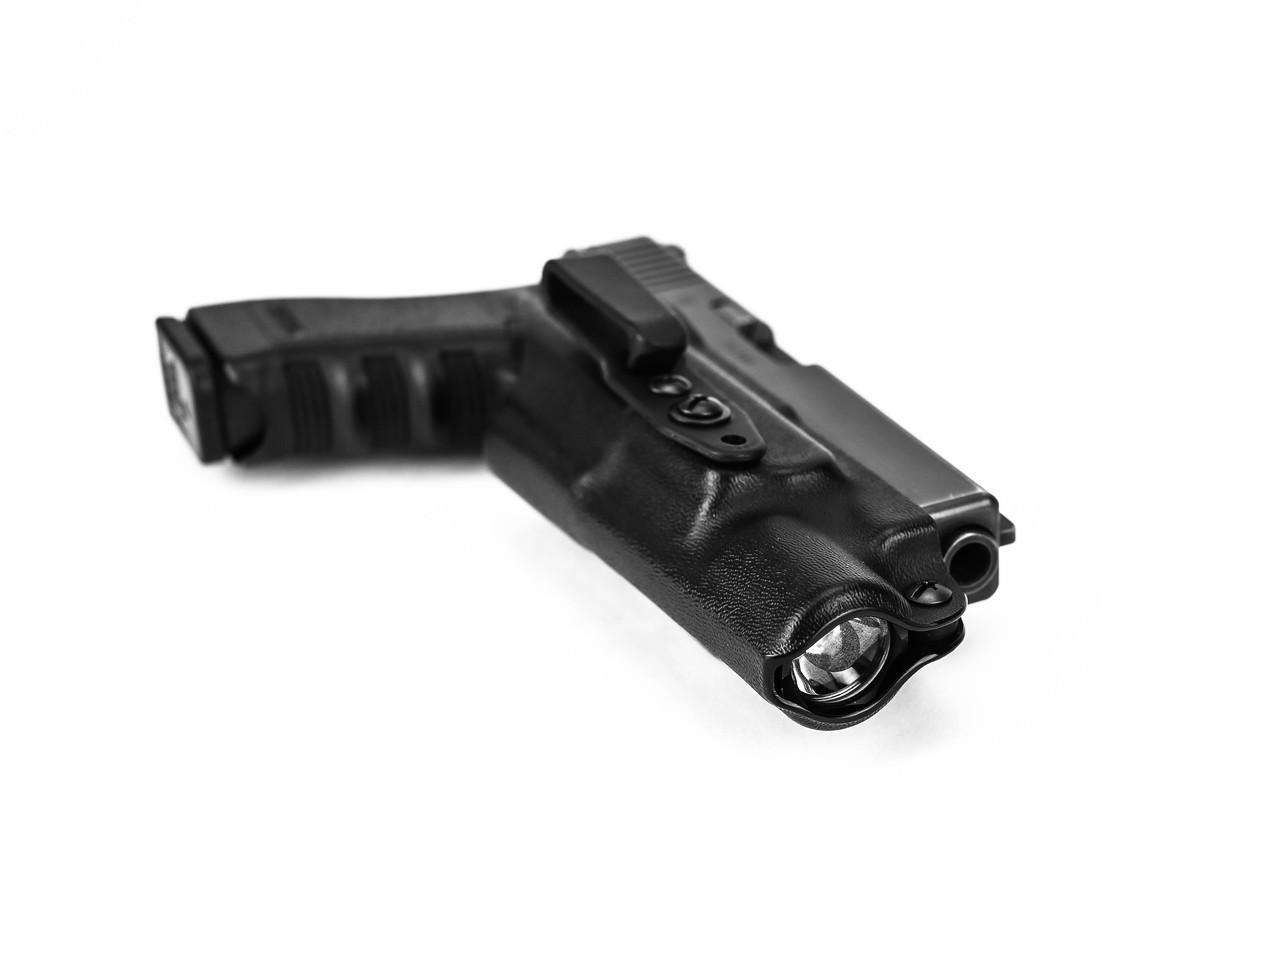 Raven Concealment VanGuard 3 Light Compatible Holster